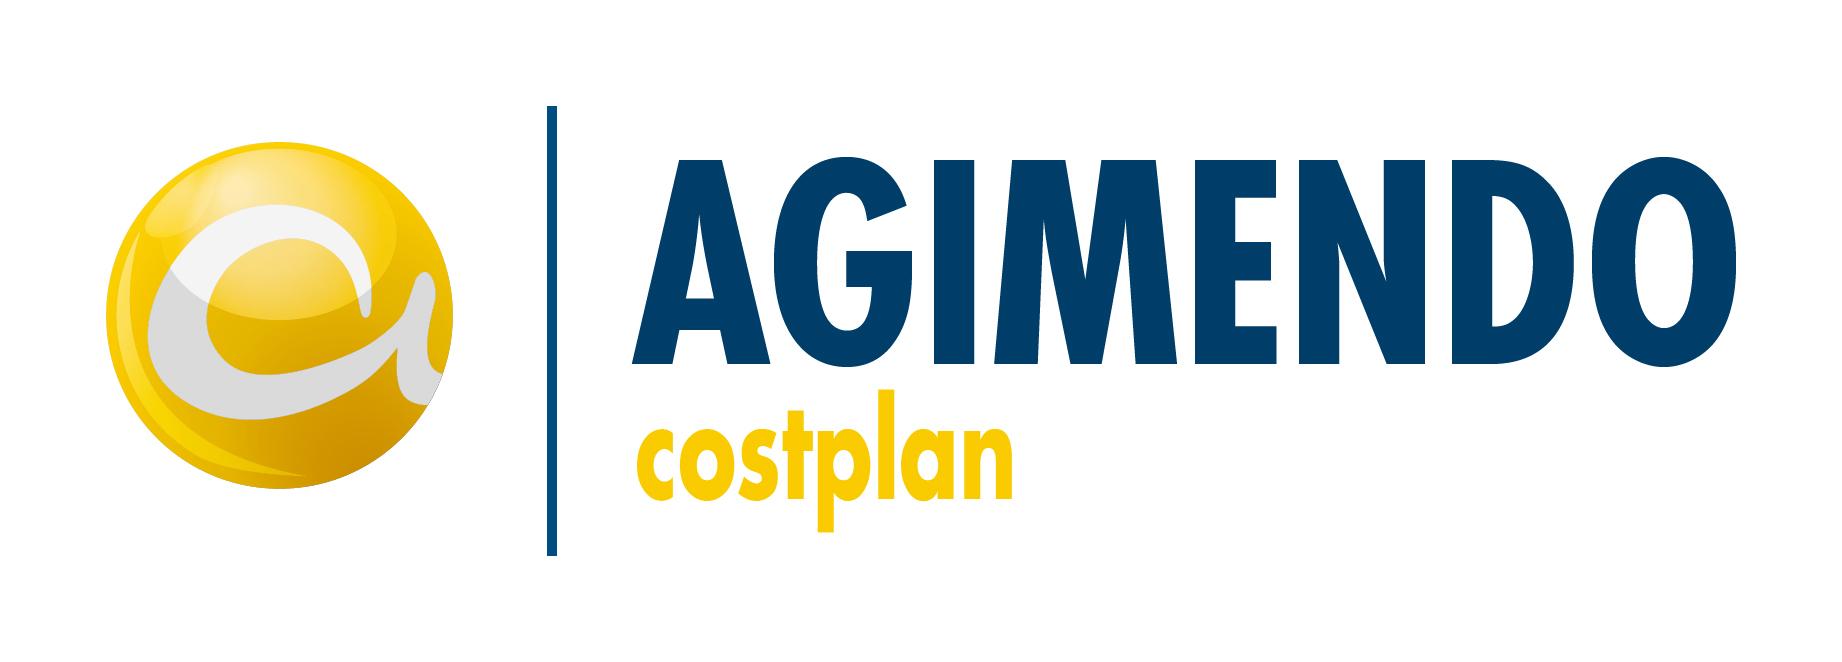 AGIMENDO.costplan_small_frame-freigestellt